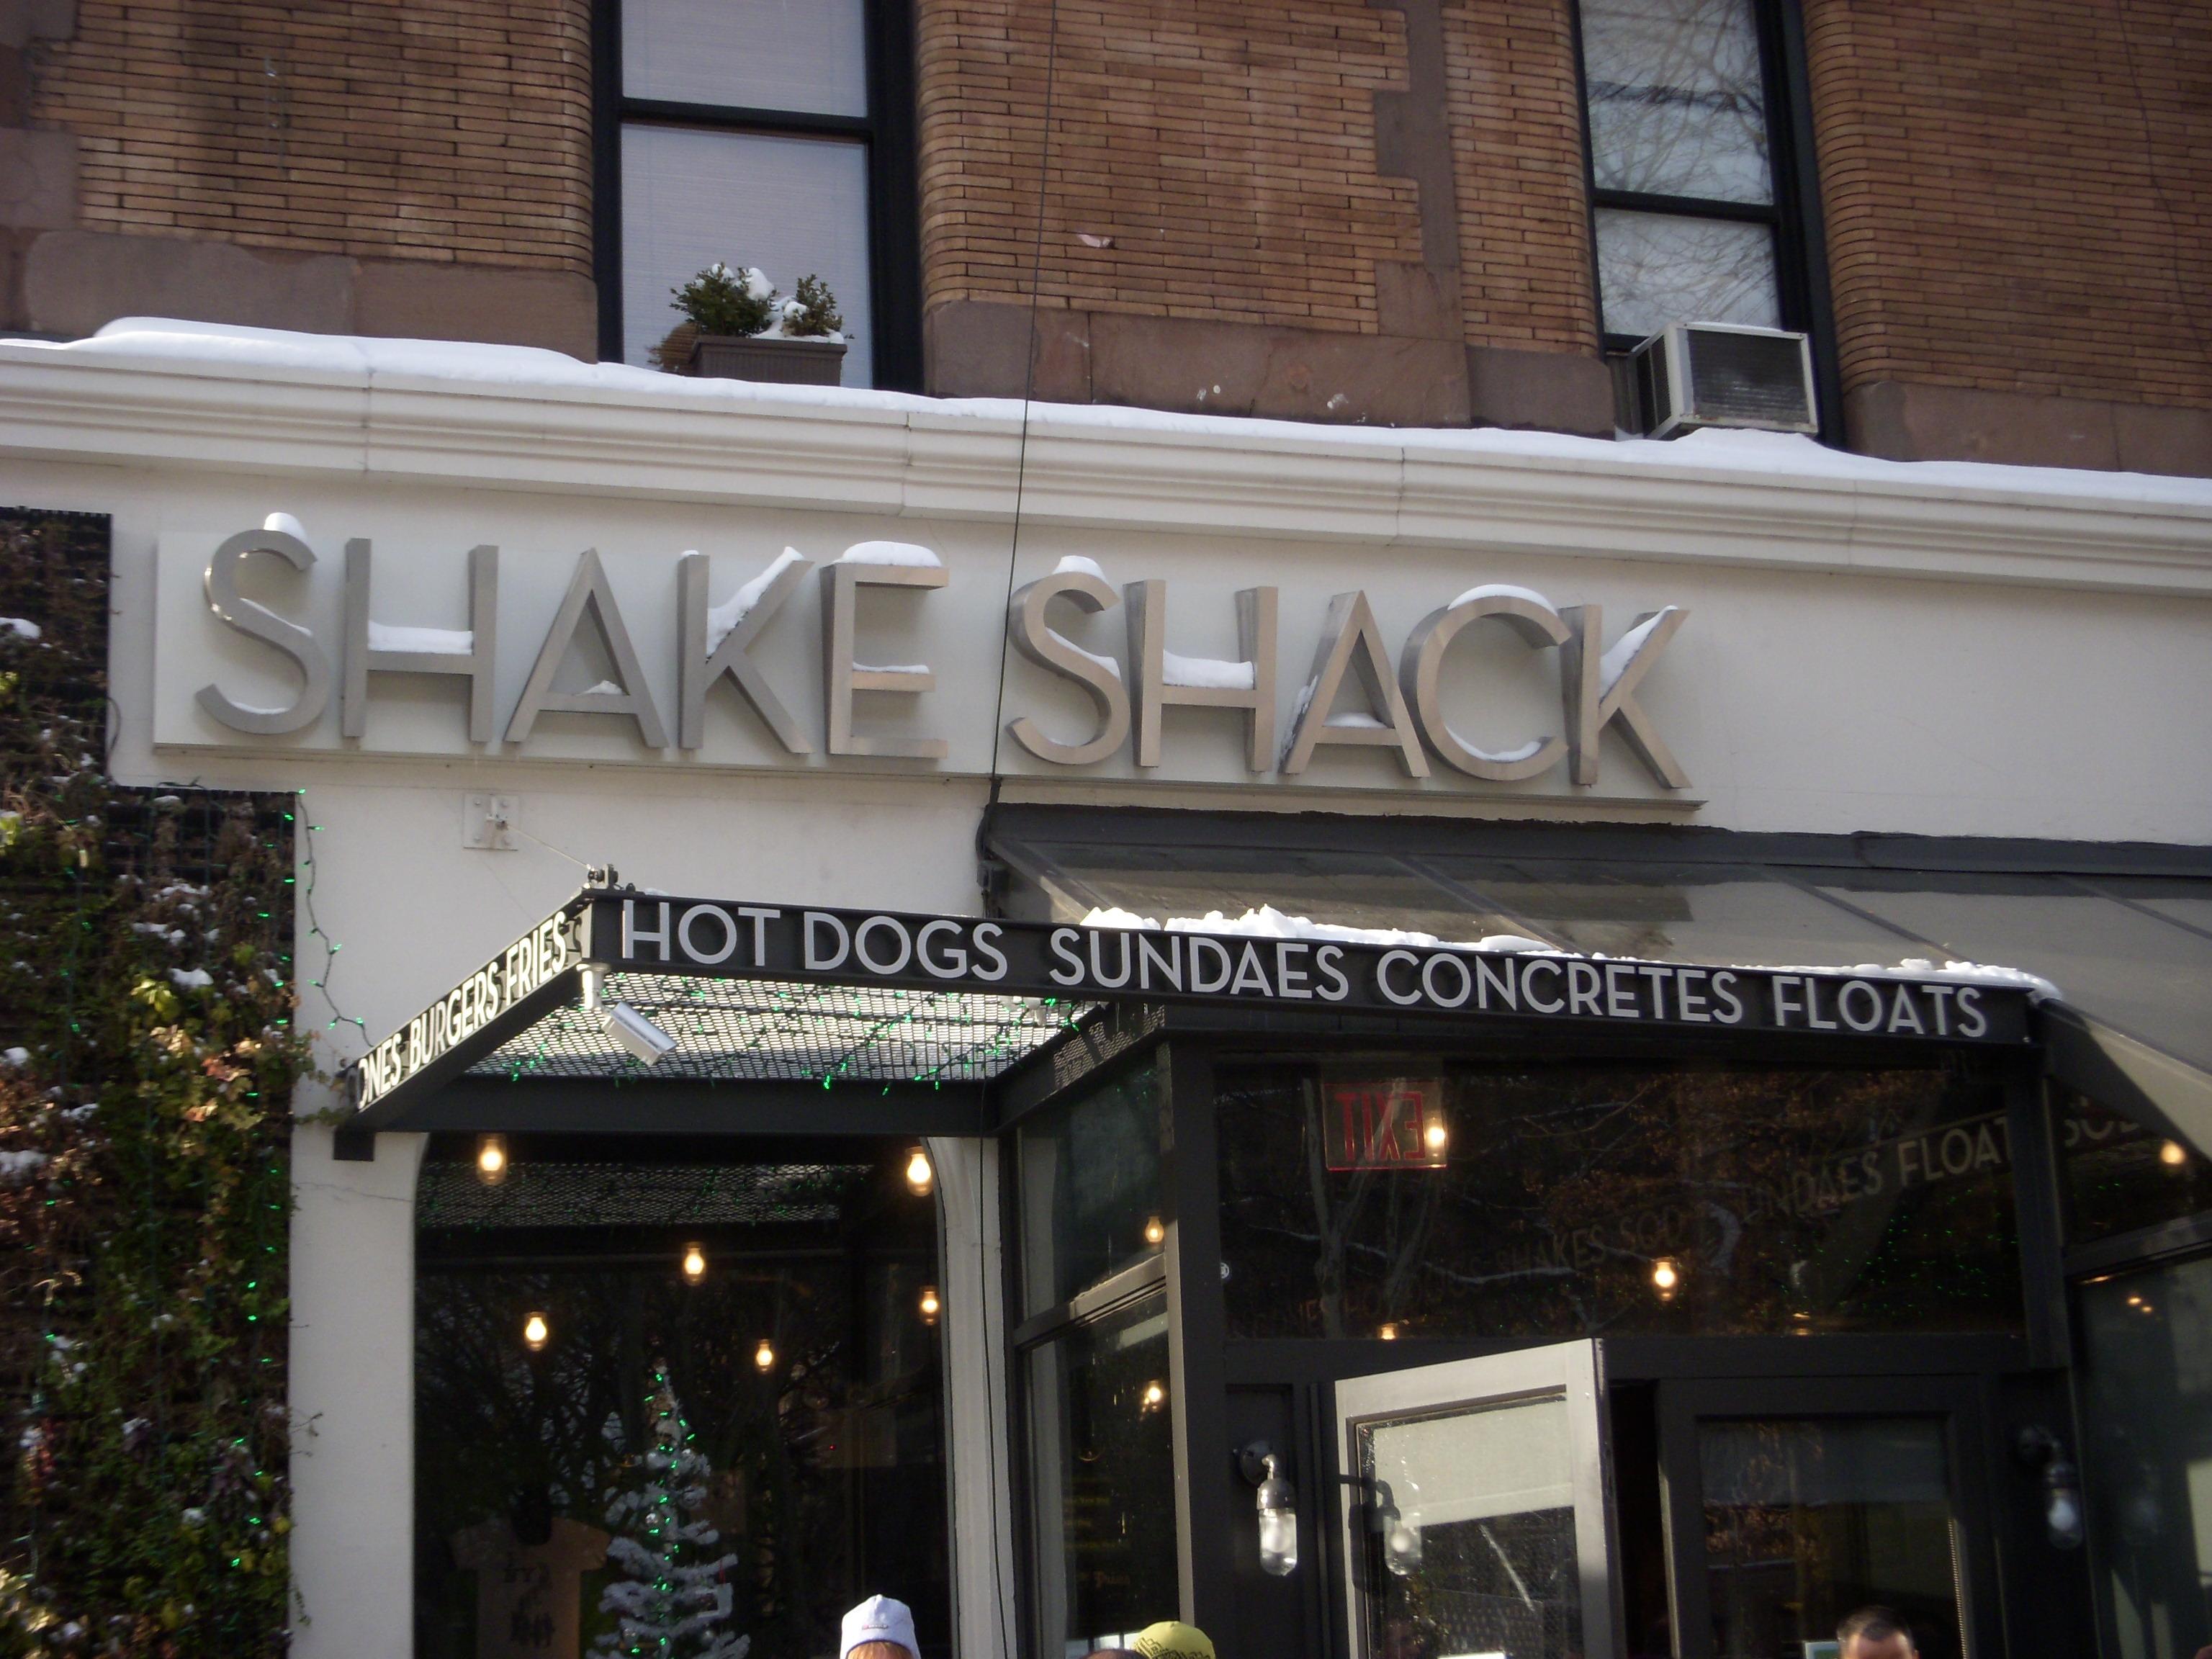 Shake Shack (Upper West Side) « Two Fat Bellies